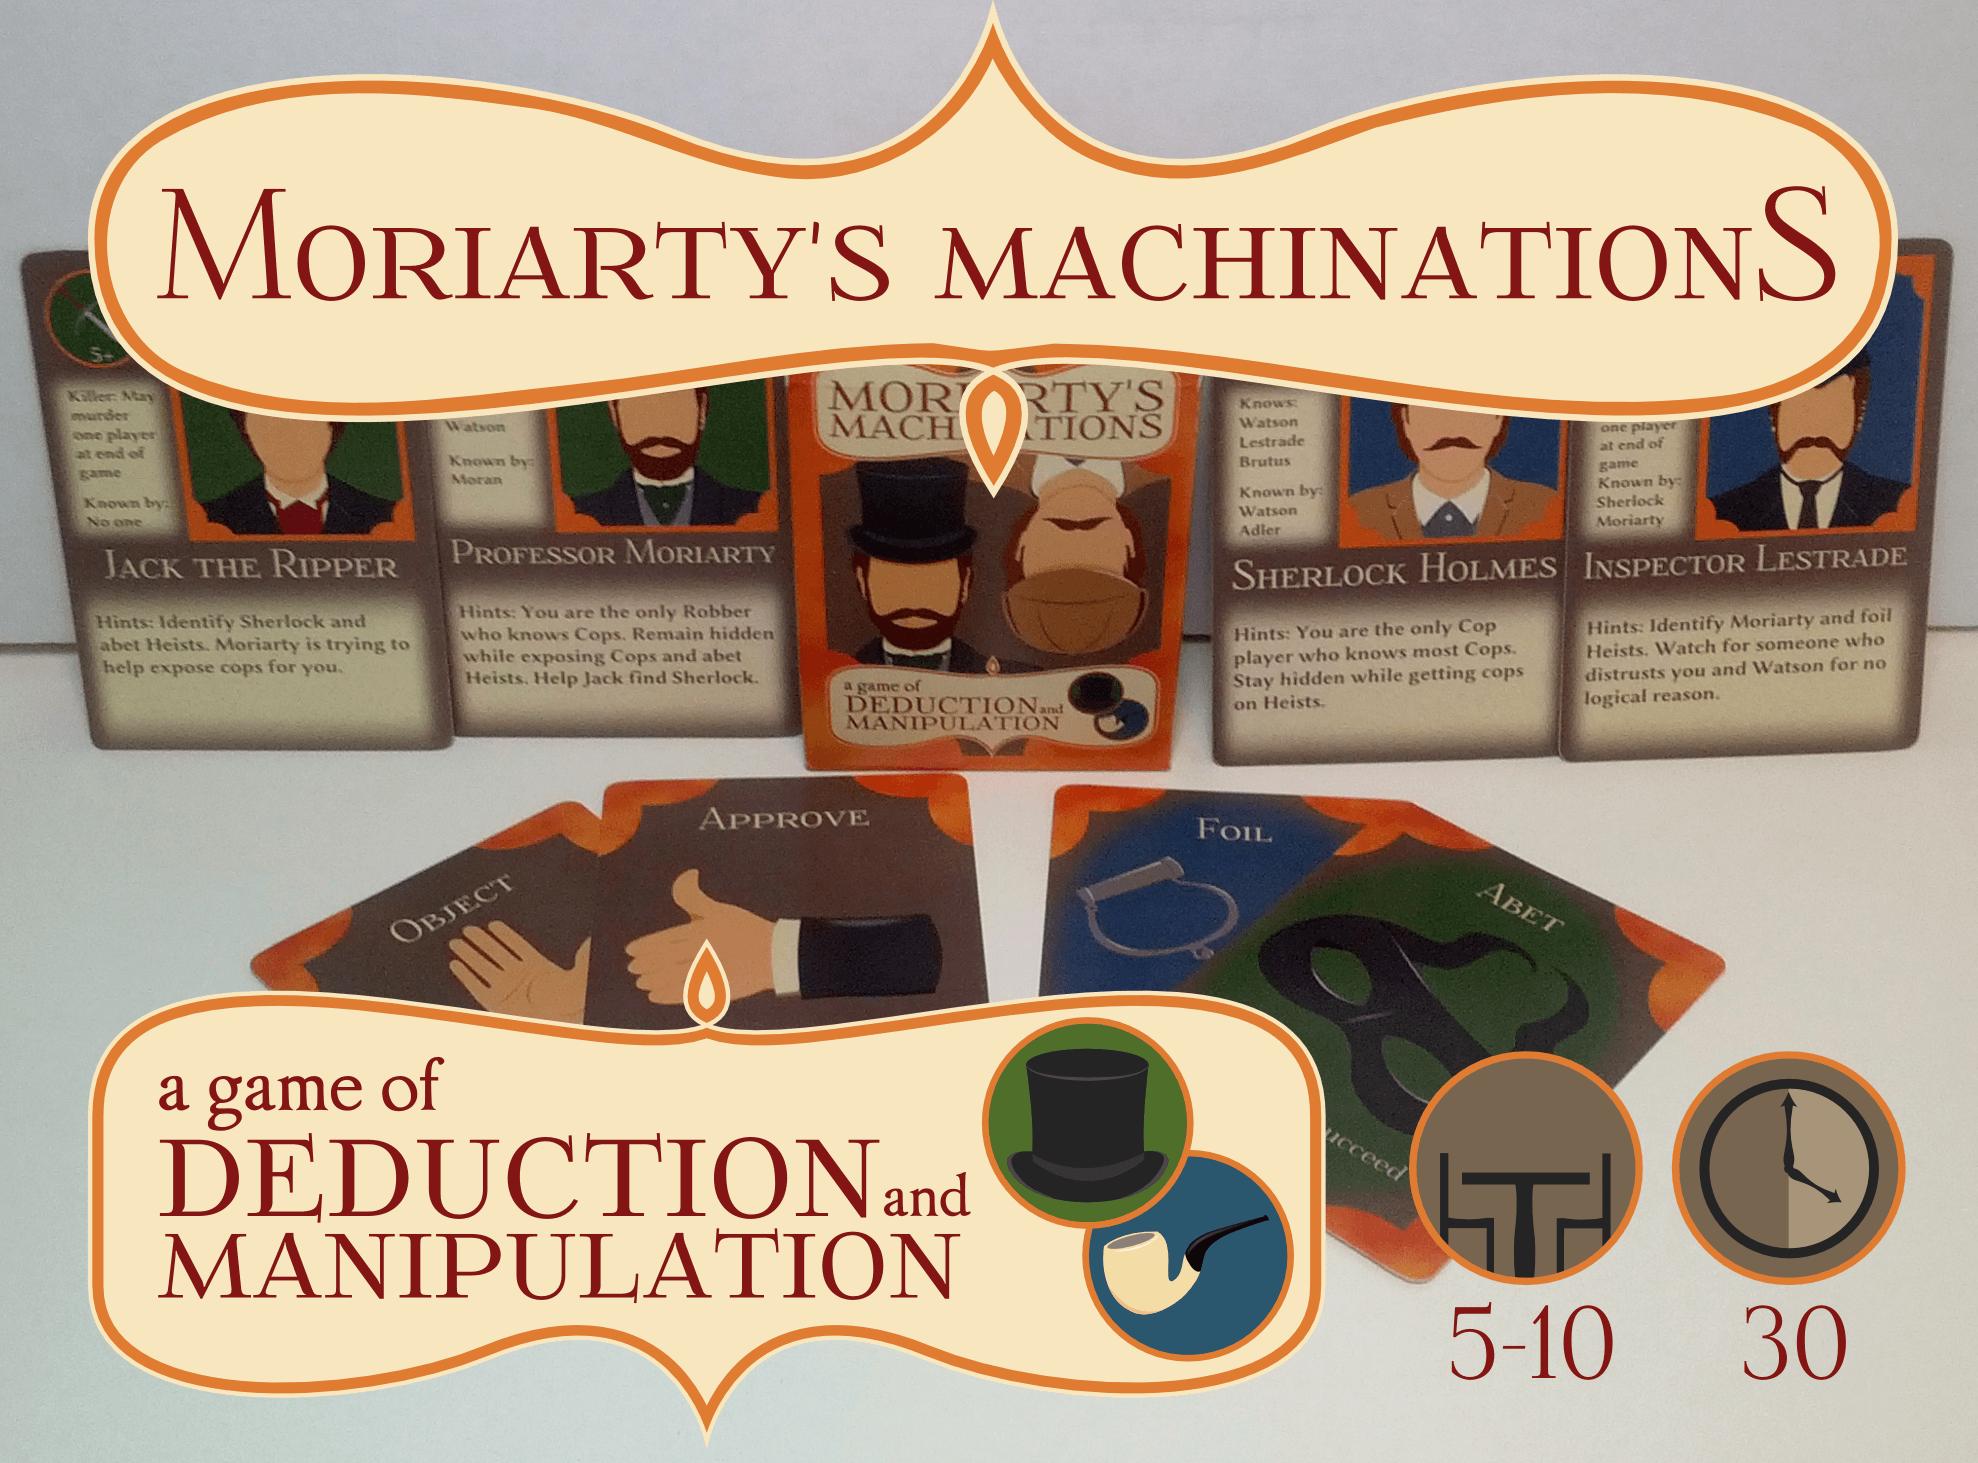 настольная игра Moriarty's Machinations Махинации Мориарти